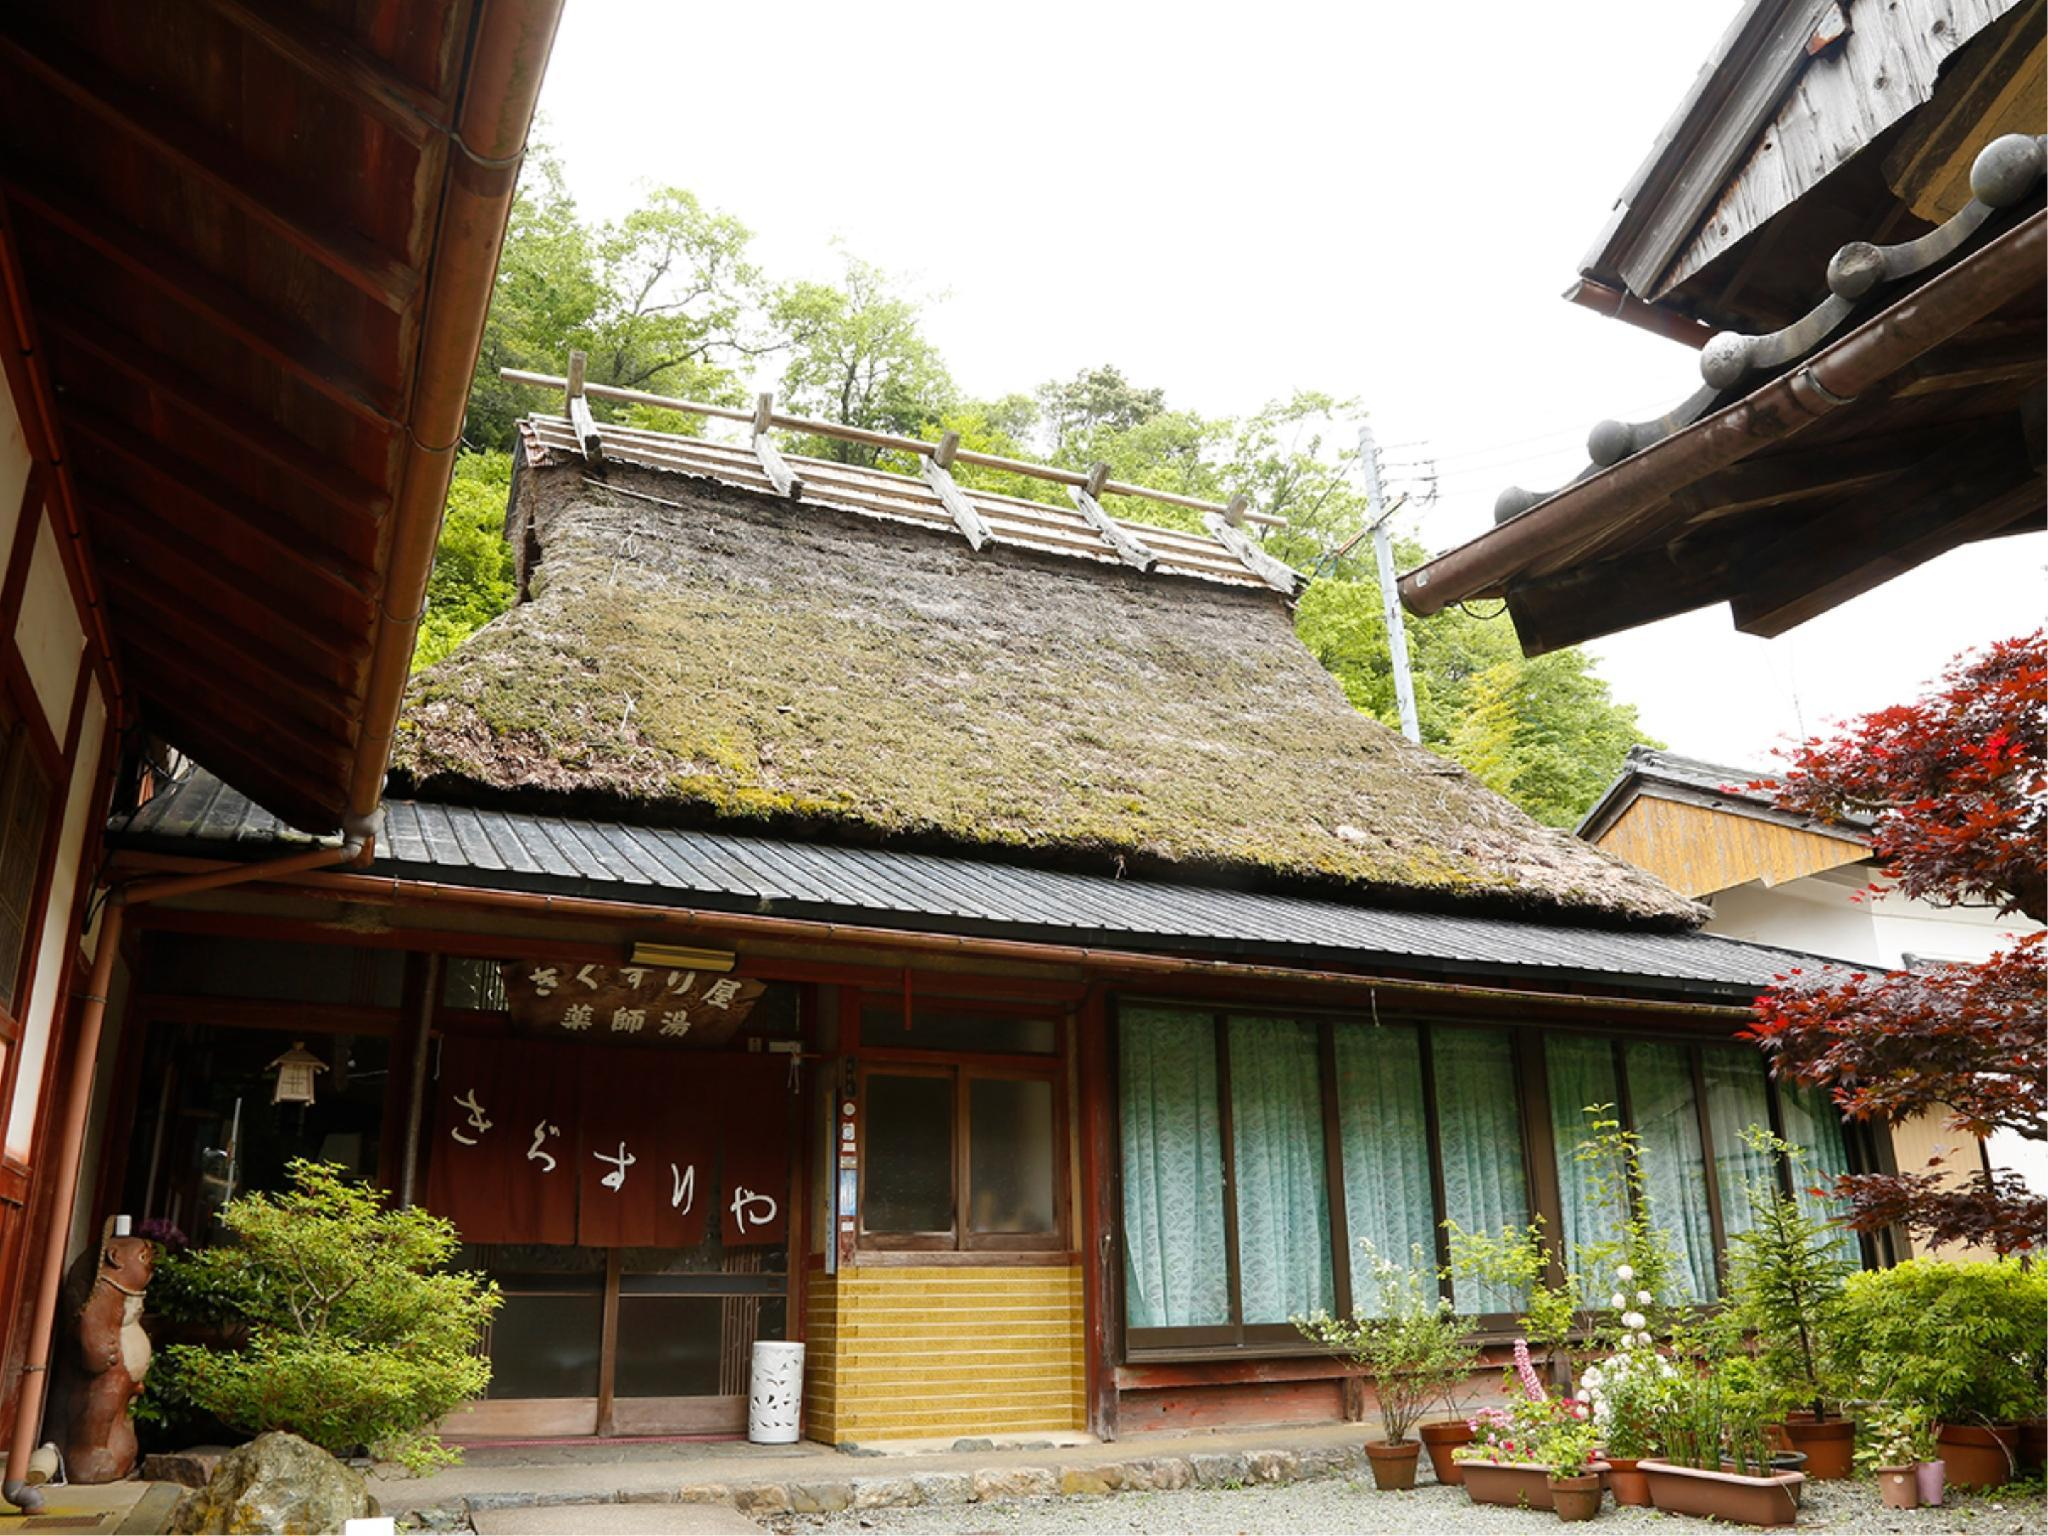 Kigusuriya Ryokan